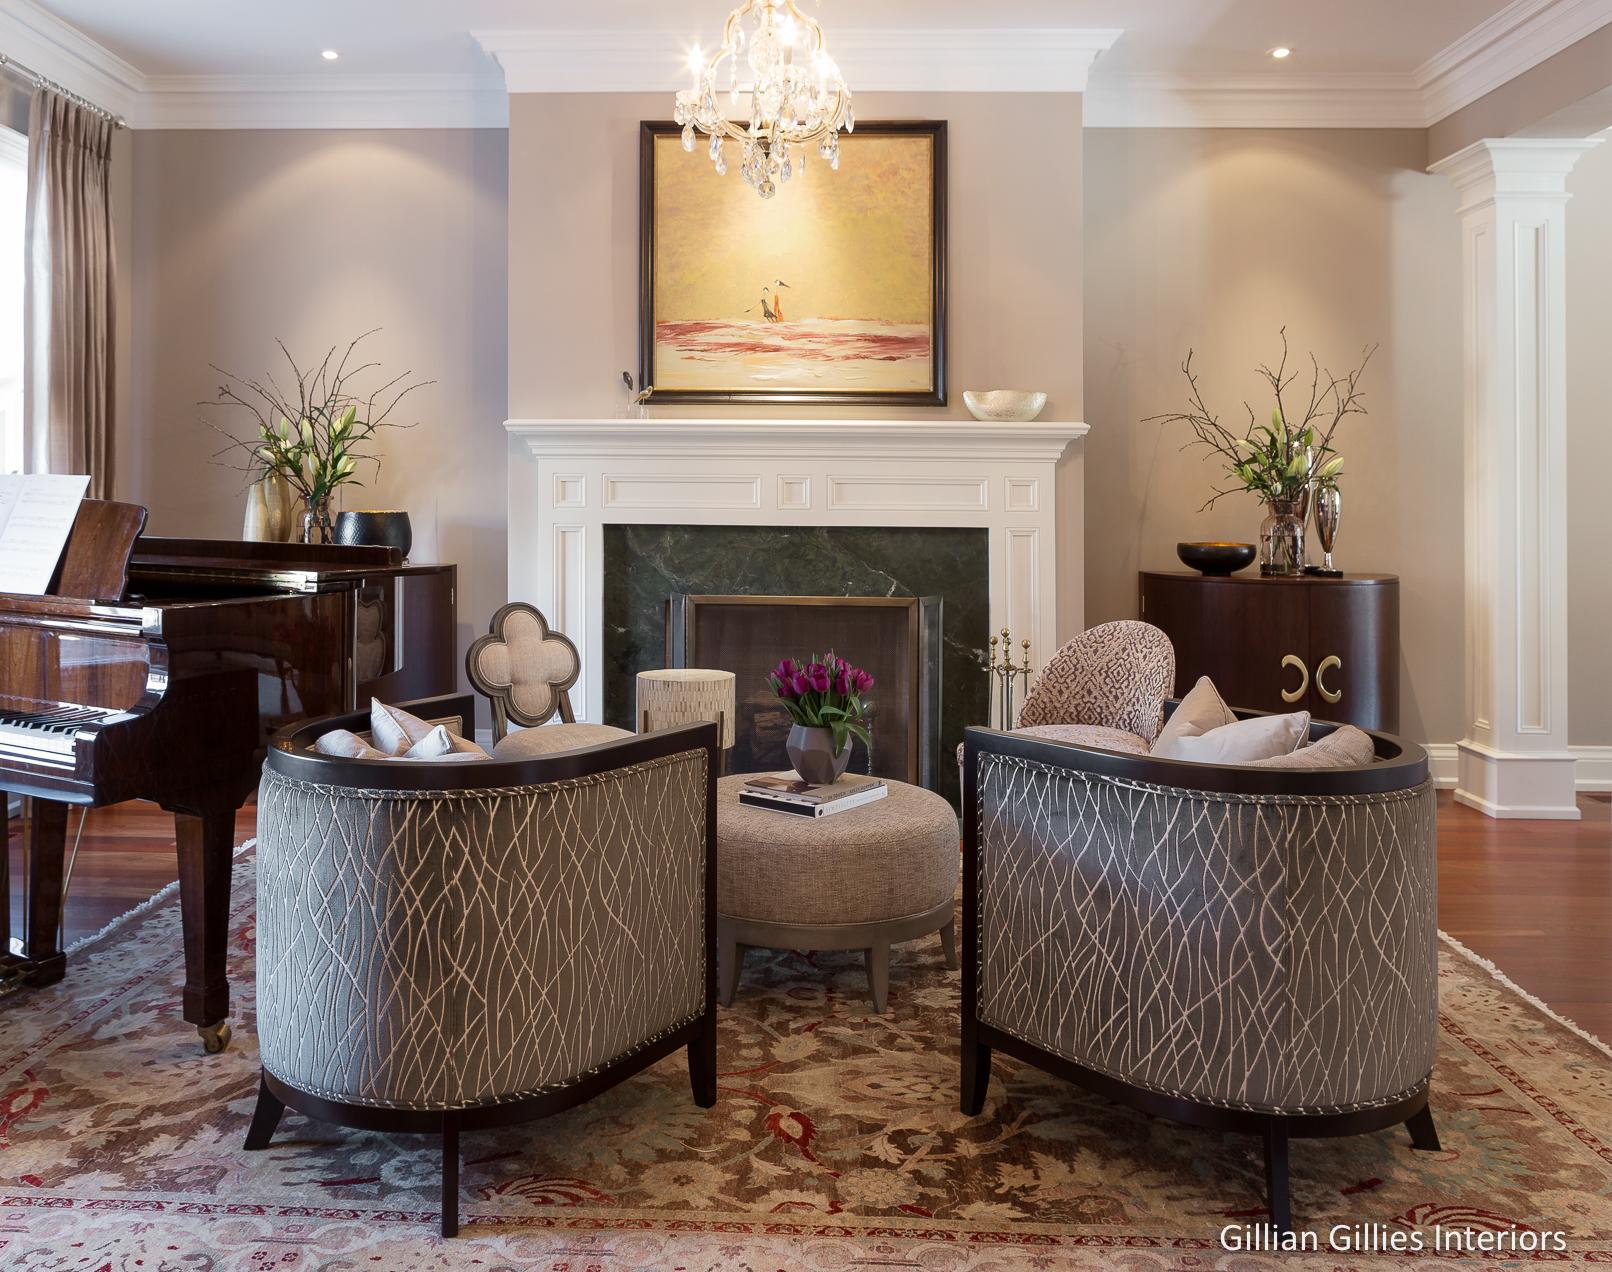 Gillian Gillies Interiors